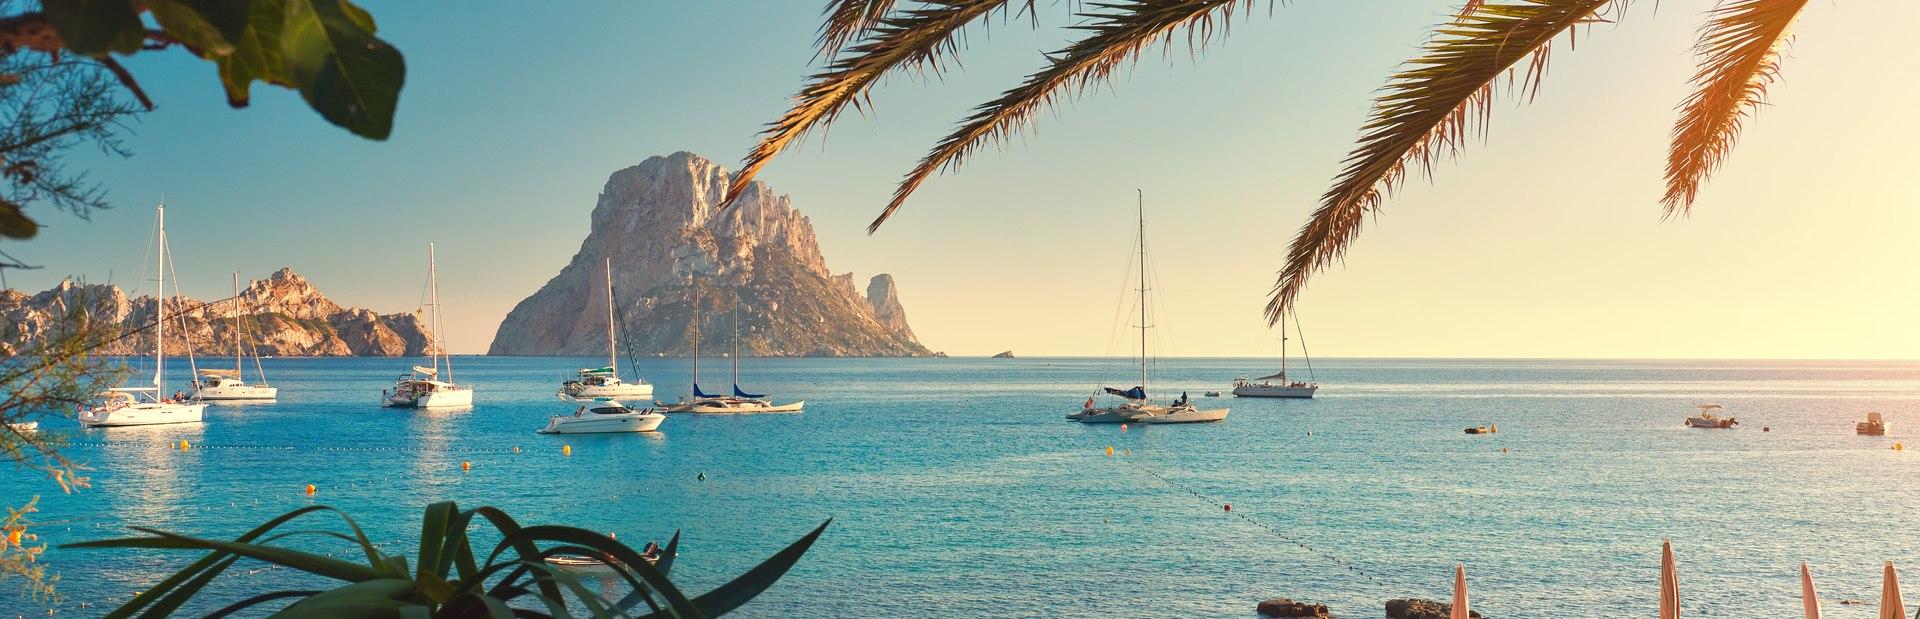 Ibiza inspiration and tips